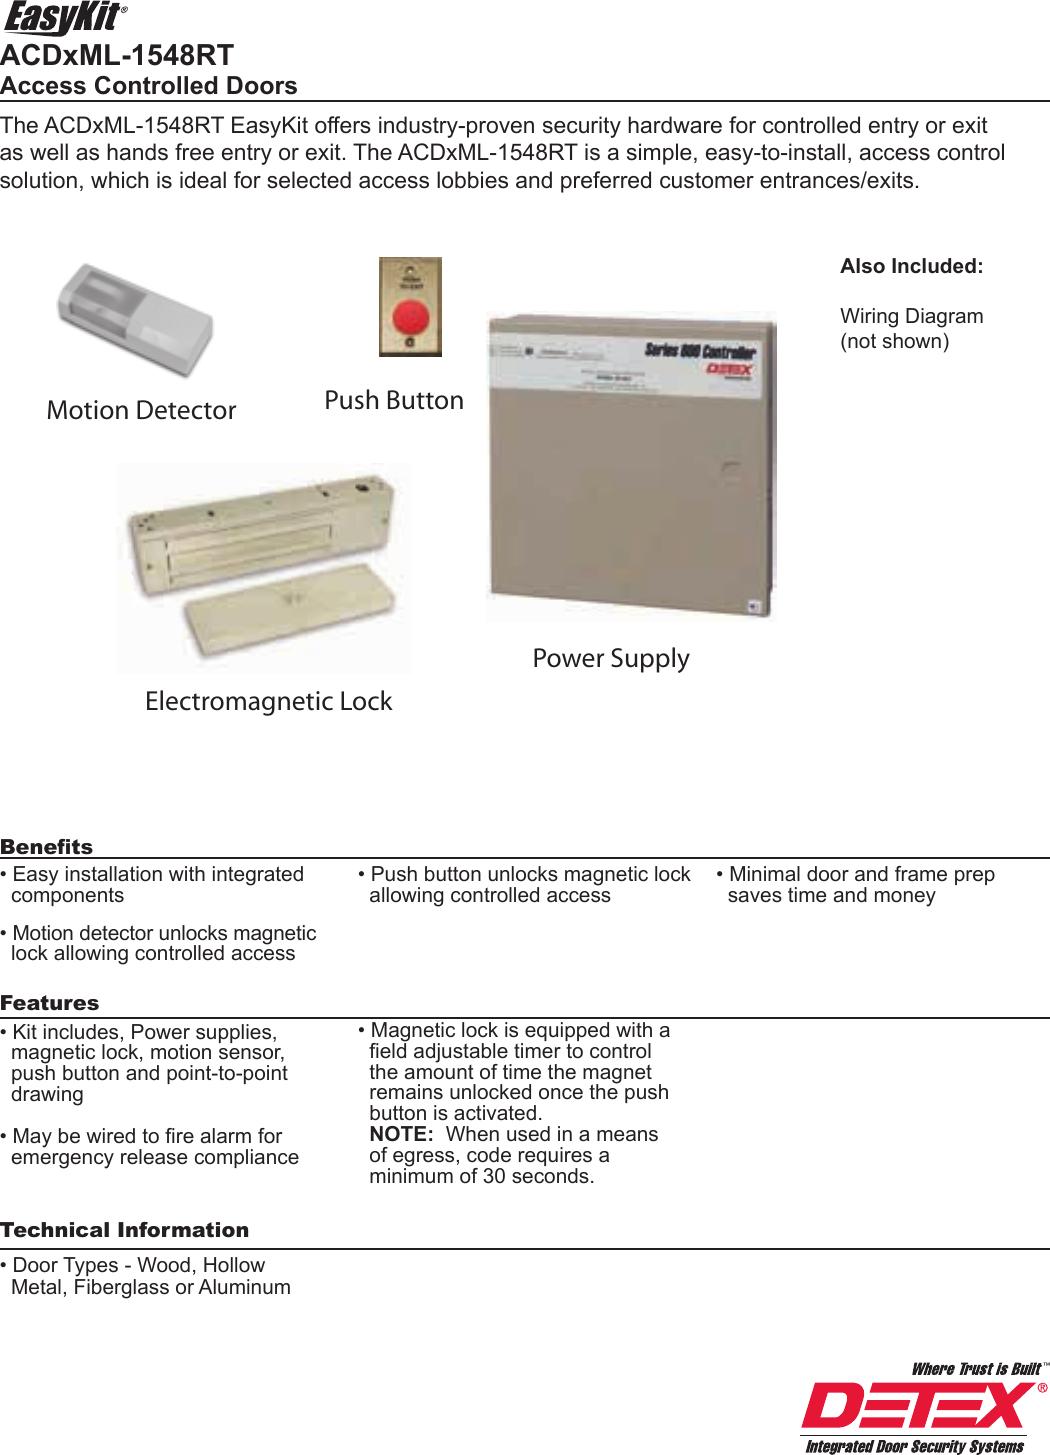 Detex Product Catalog Detexcatalog on